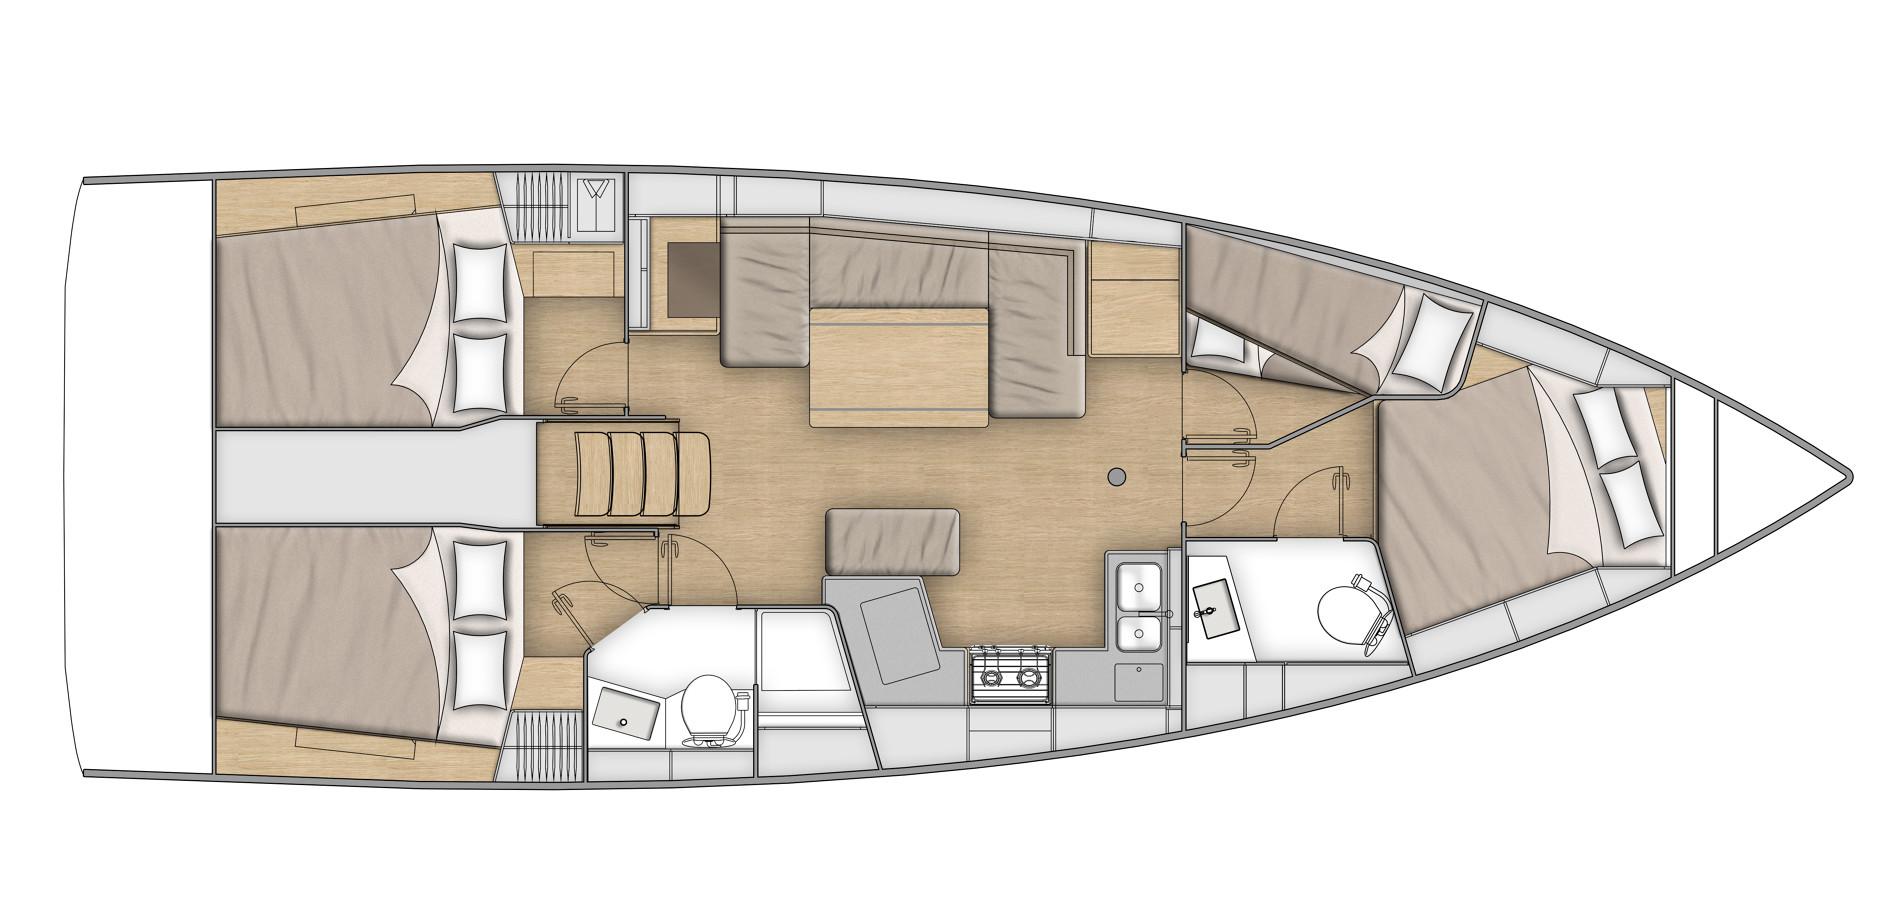 OC40-layout-4c-2t.jpg-1900px